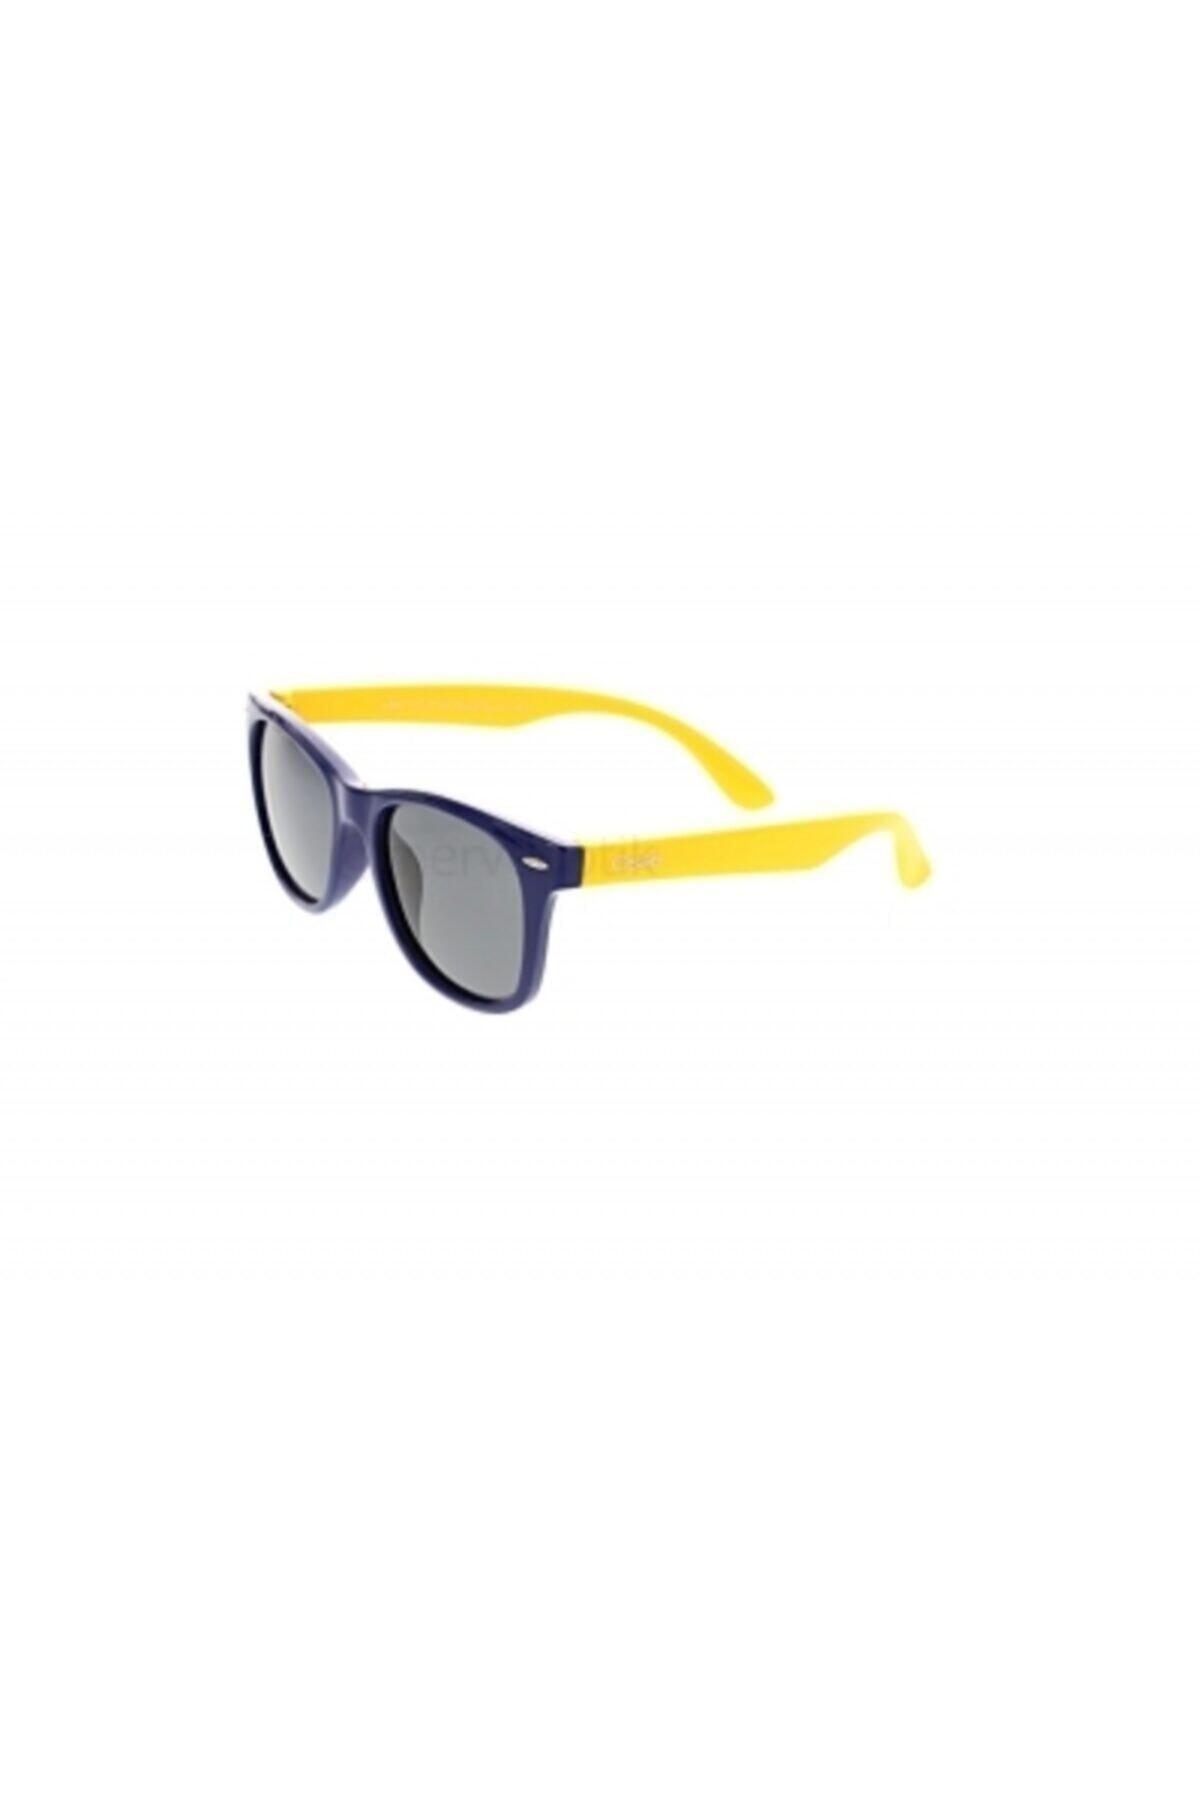 سفارش عینک آفتابی پسرانه ارزان برند Osse رنگ لاجوردی کد ty42030677